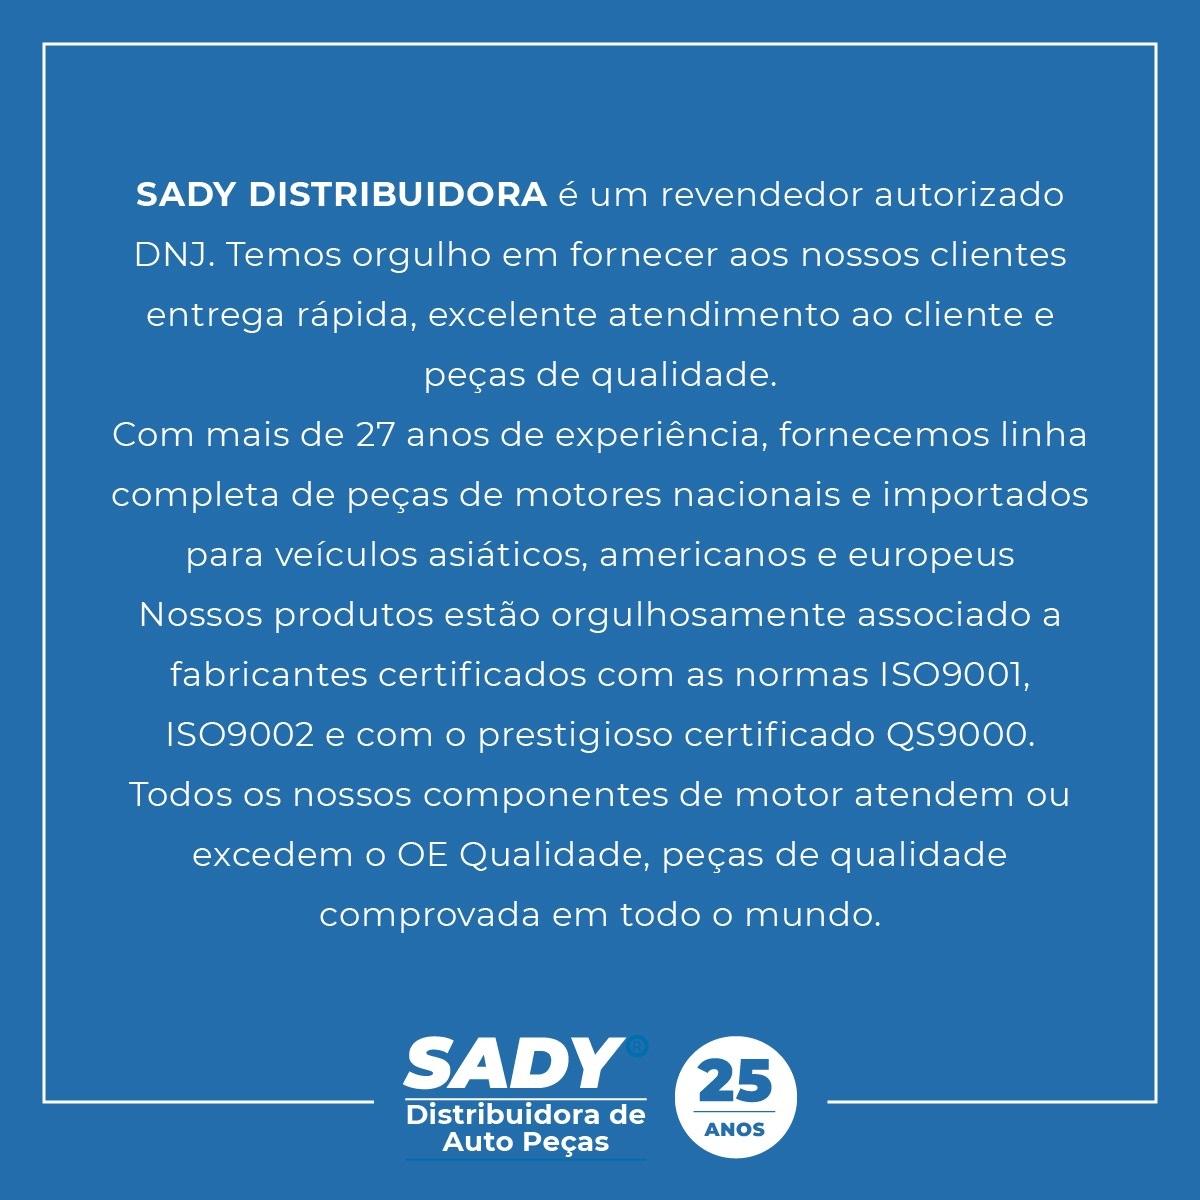 BOMBA DE OLEO DO MOTOR FIAT 2.4 16V